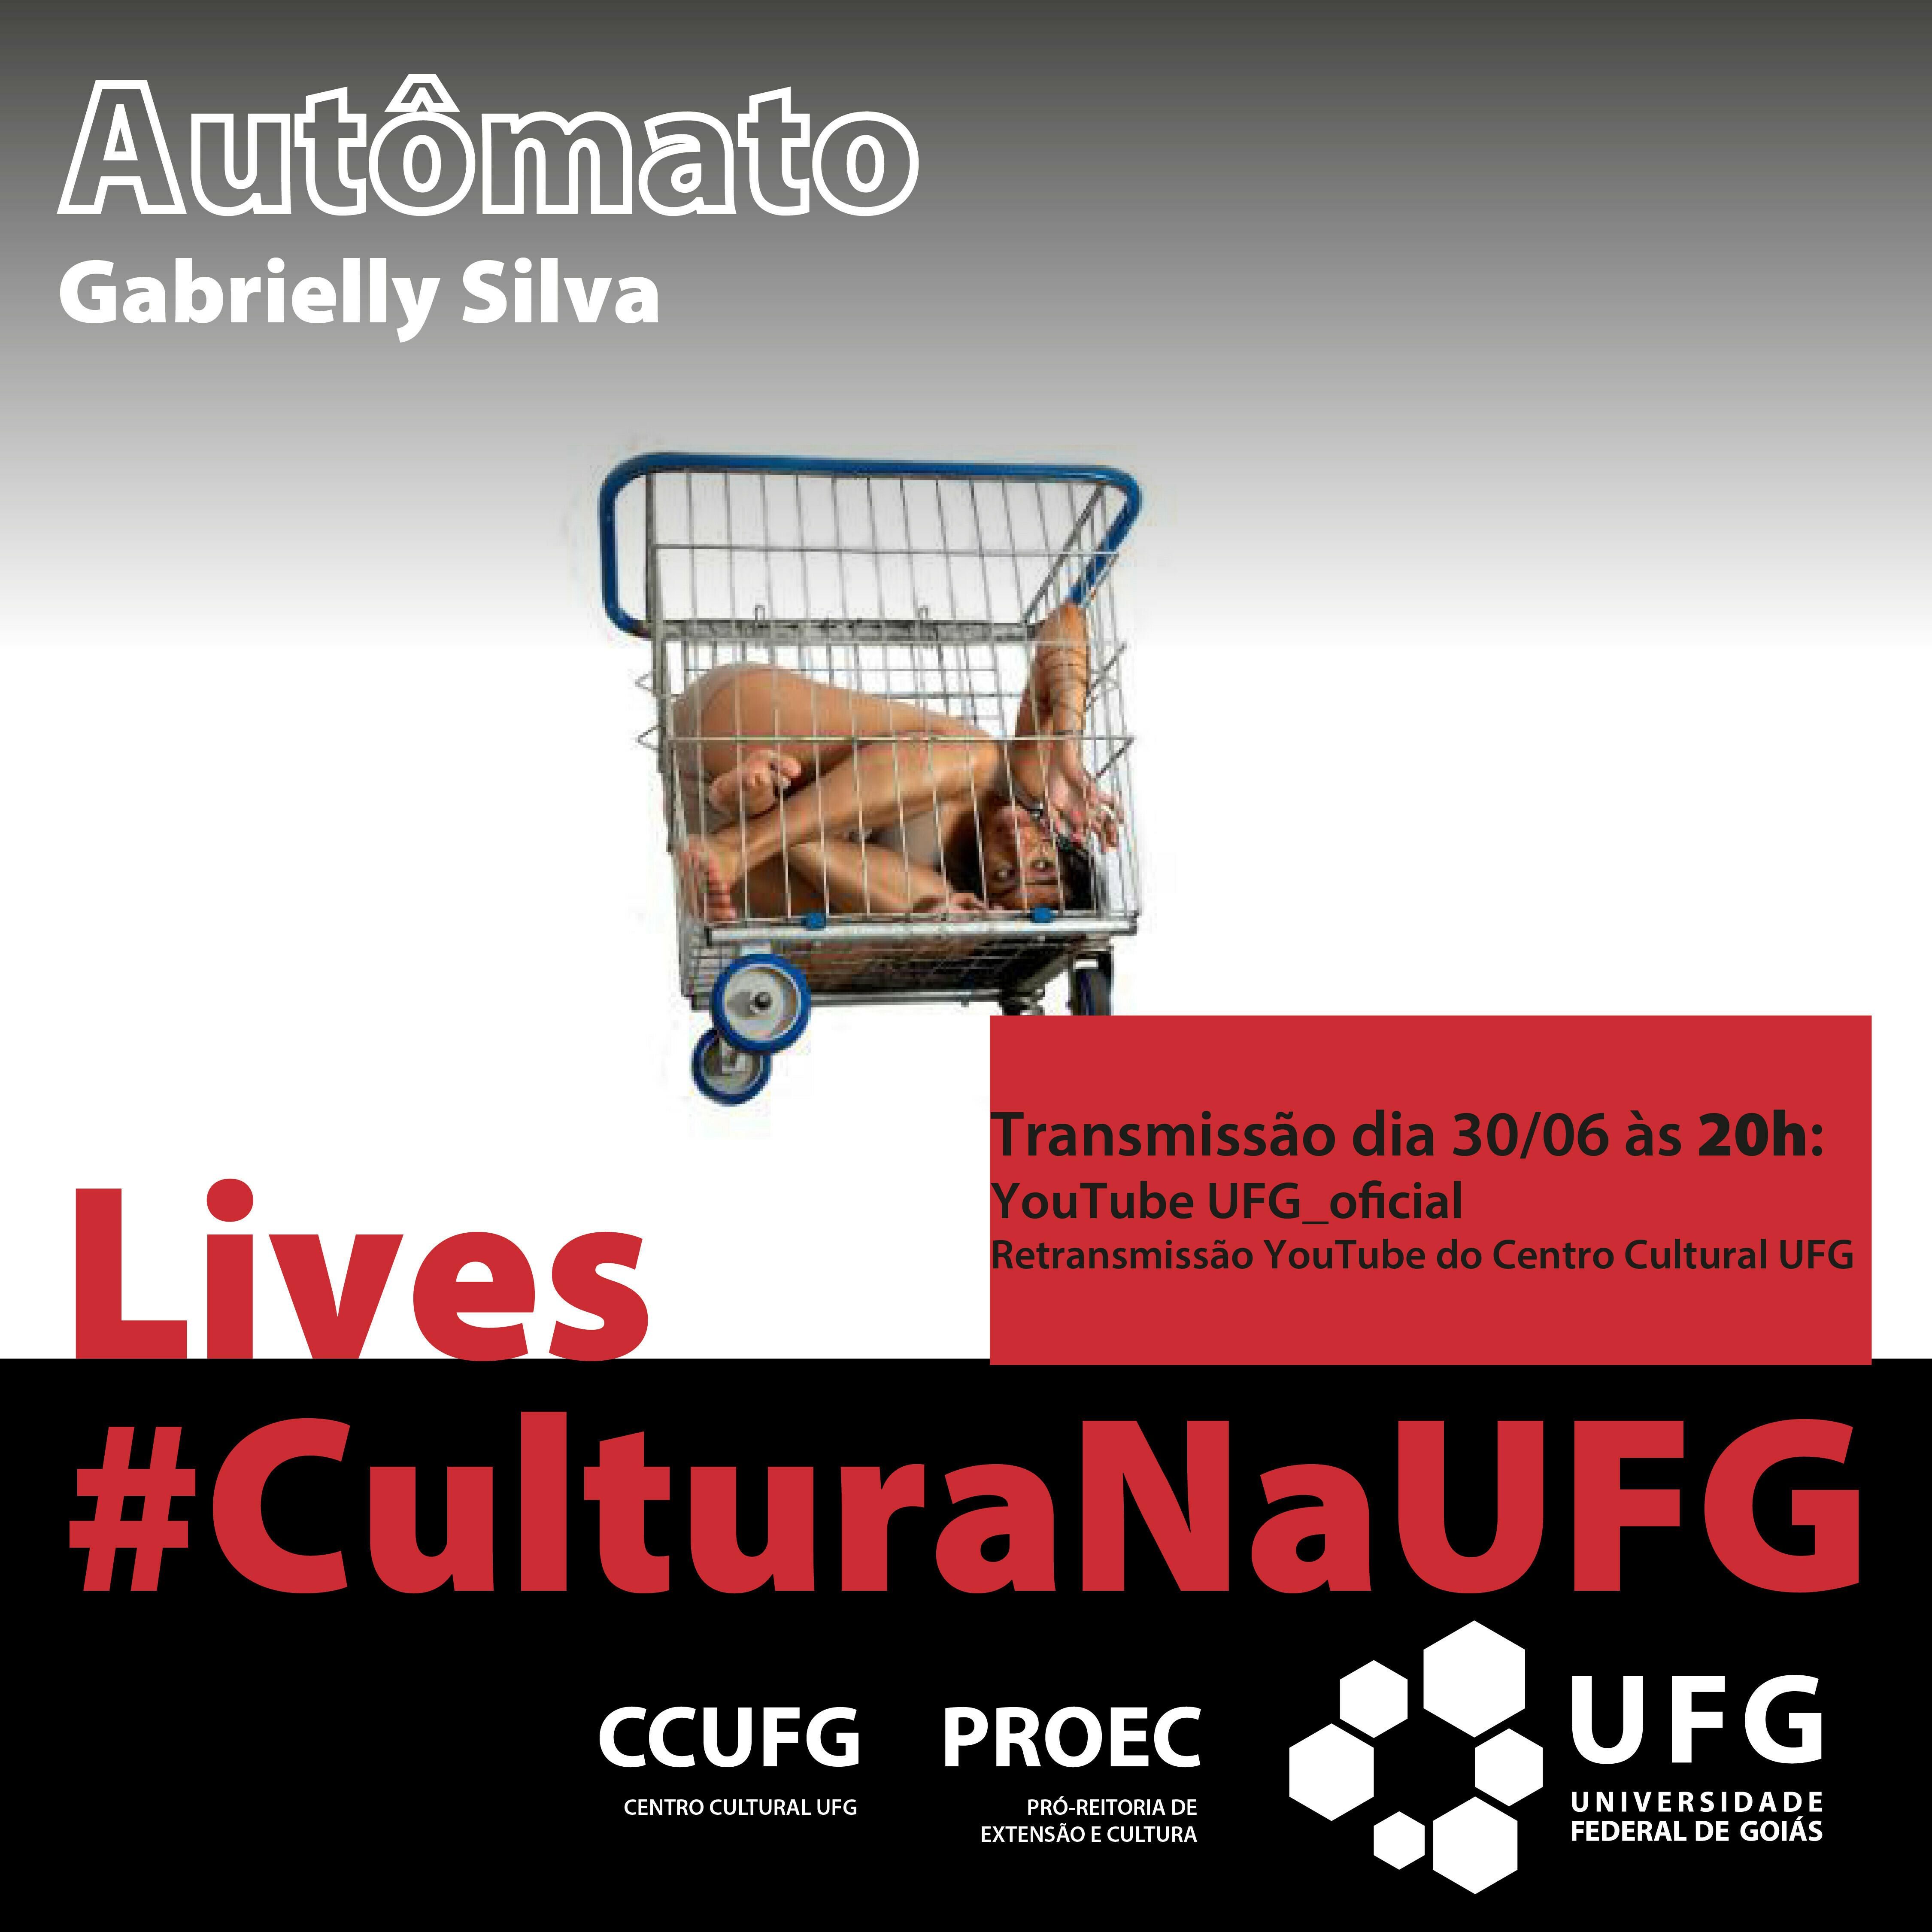 Lives__culturanaufg__Autômato__1080x1080px